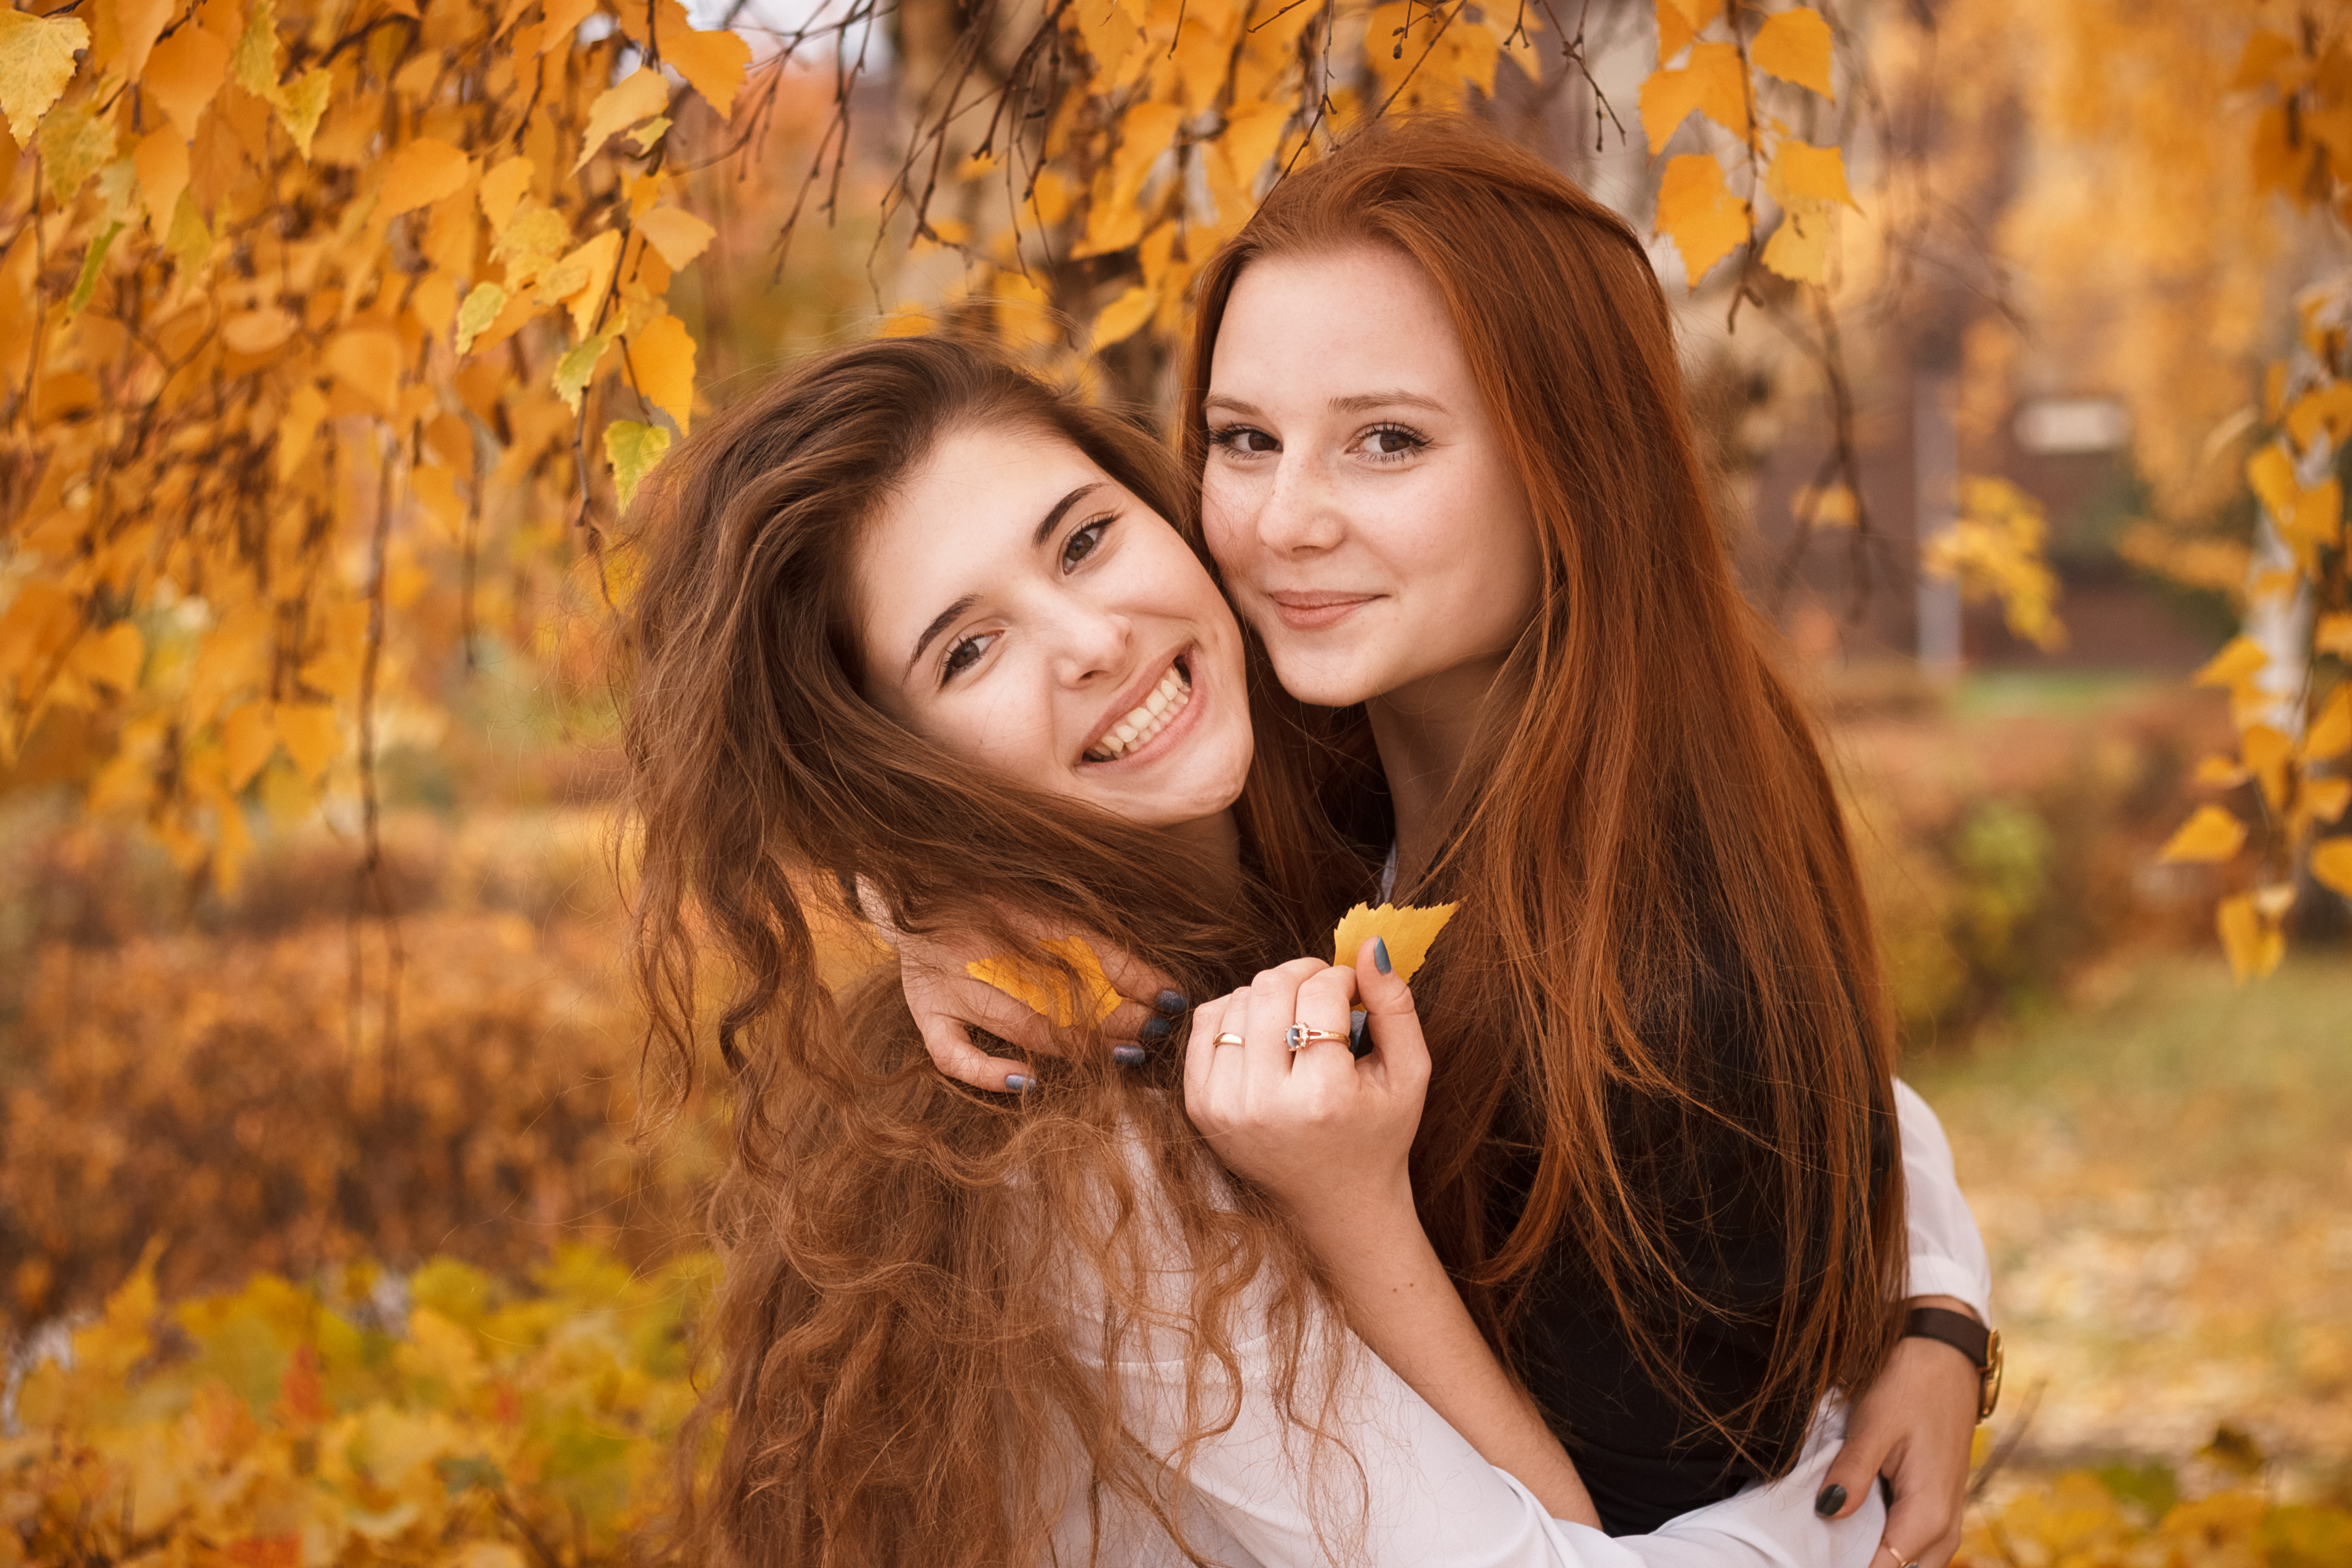 Bellas chicas pelirrojas - 4272x2848